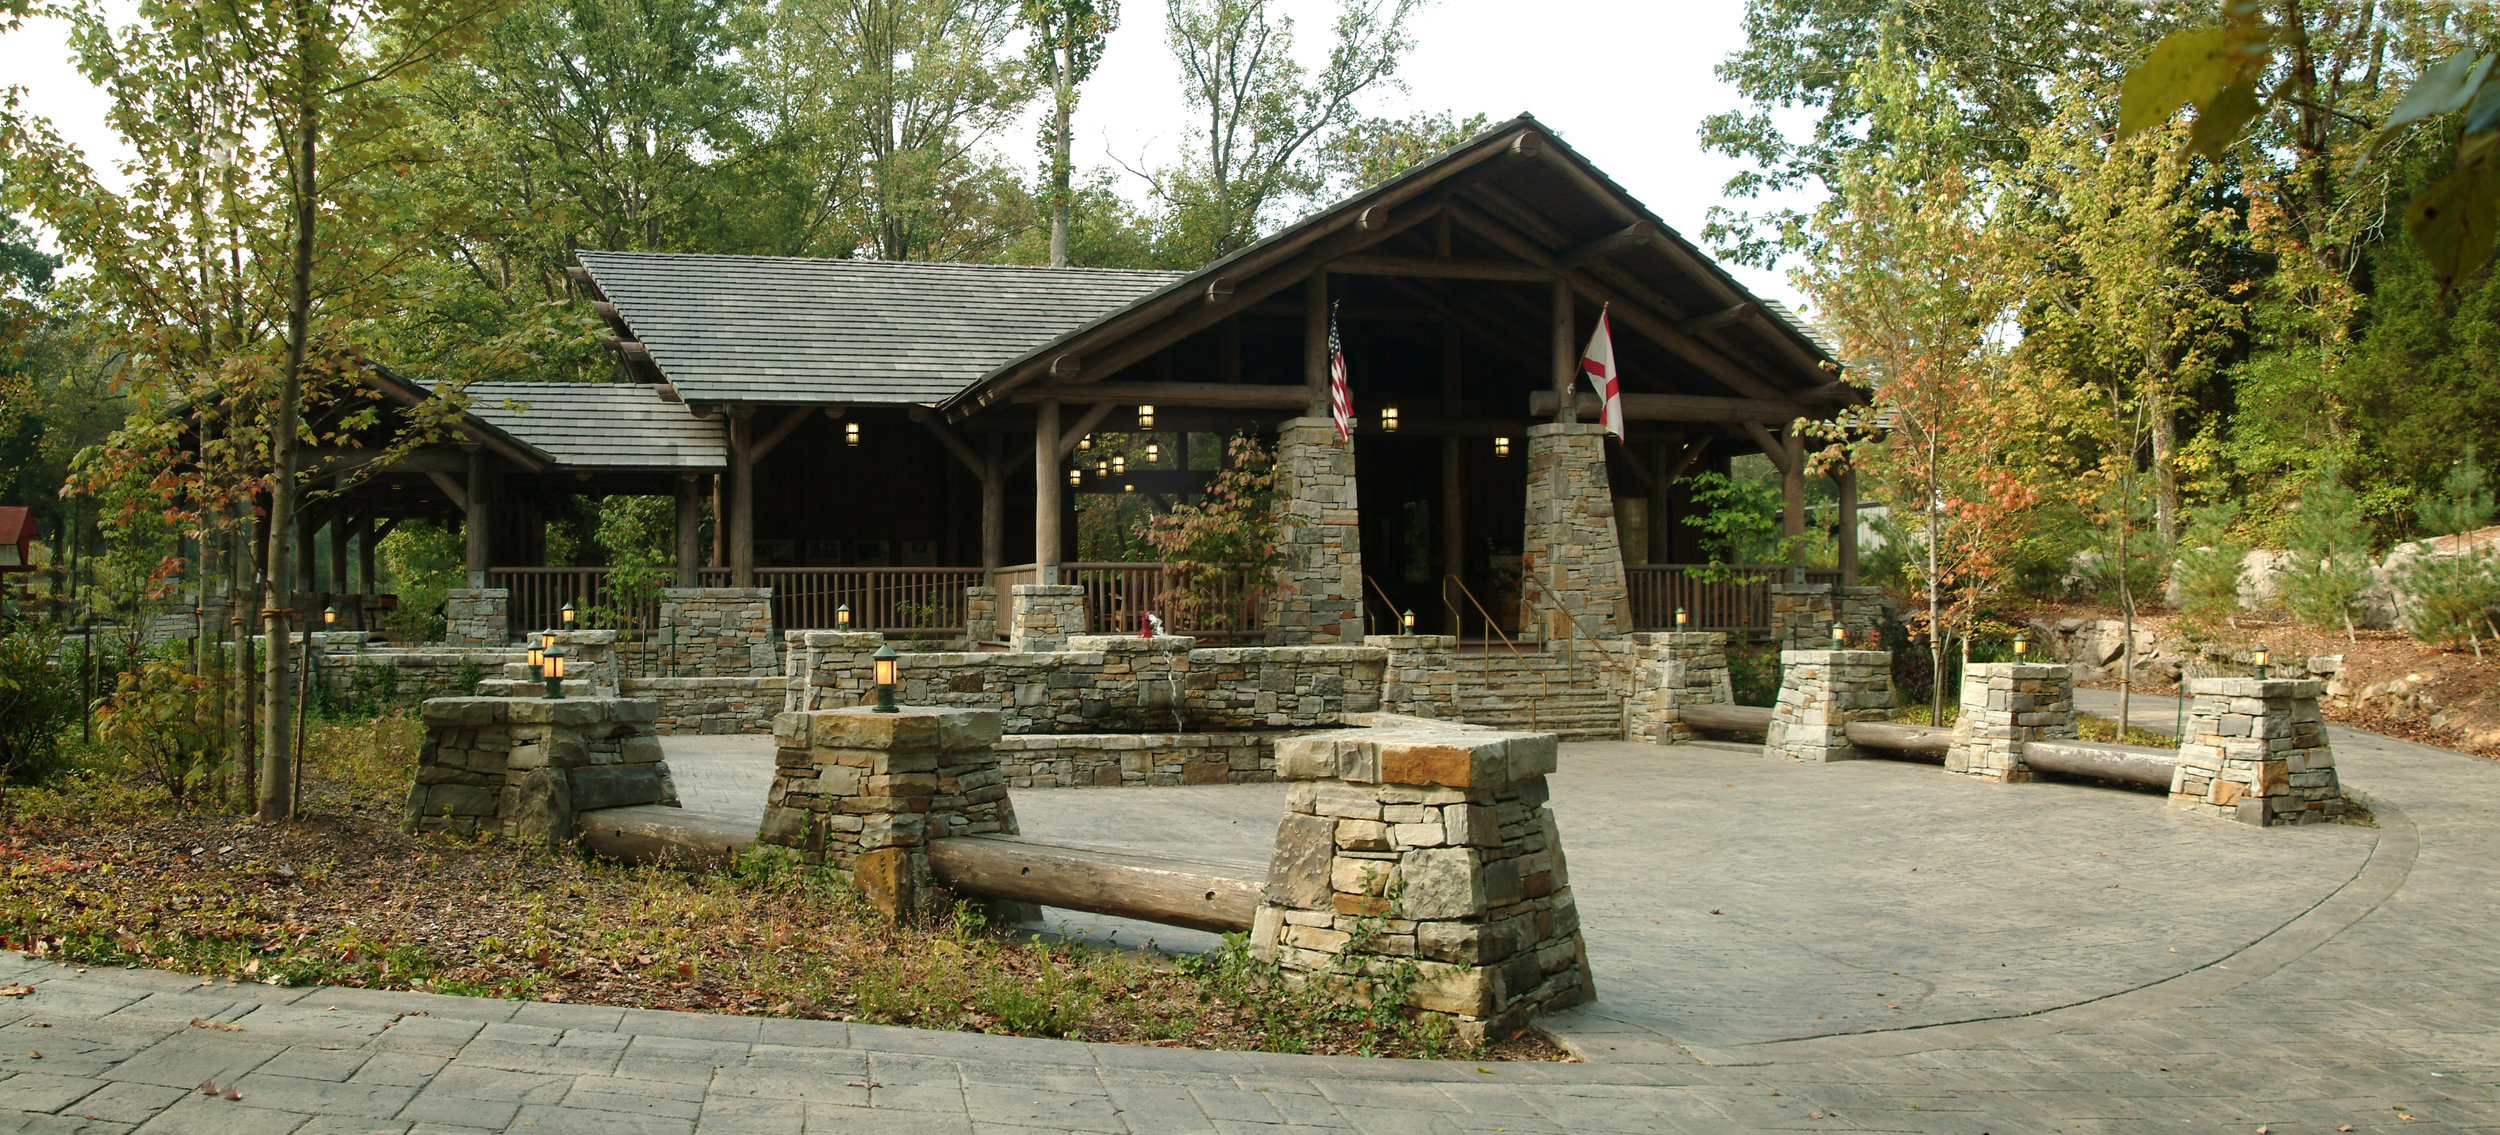 Cathedral Caverns Pavilion - Woodville, AL